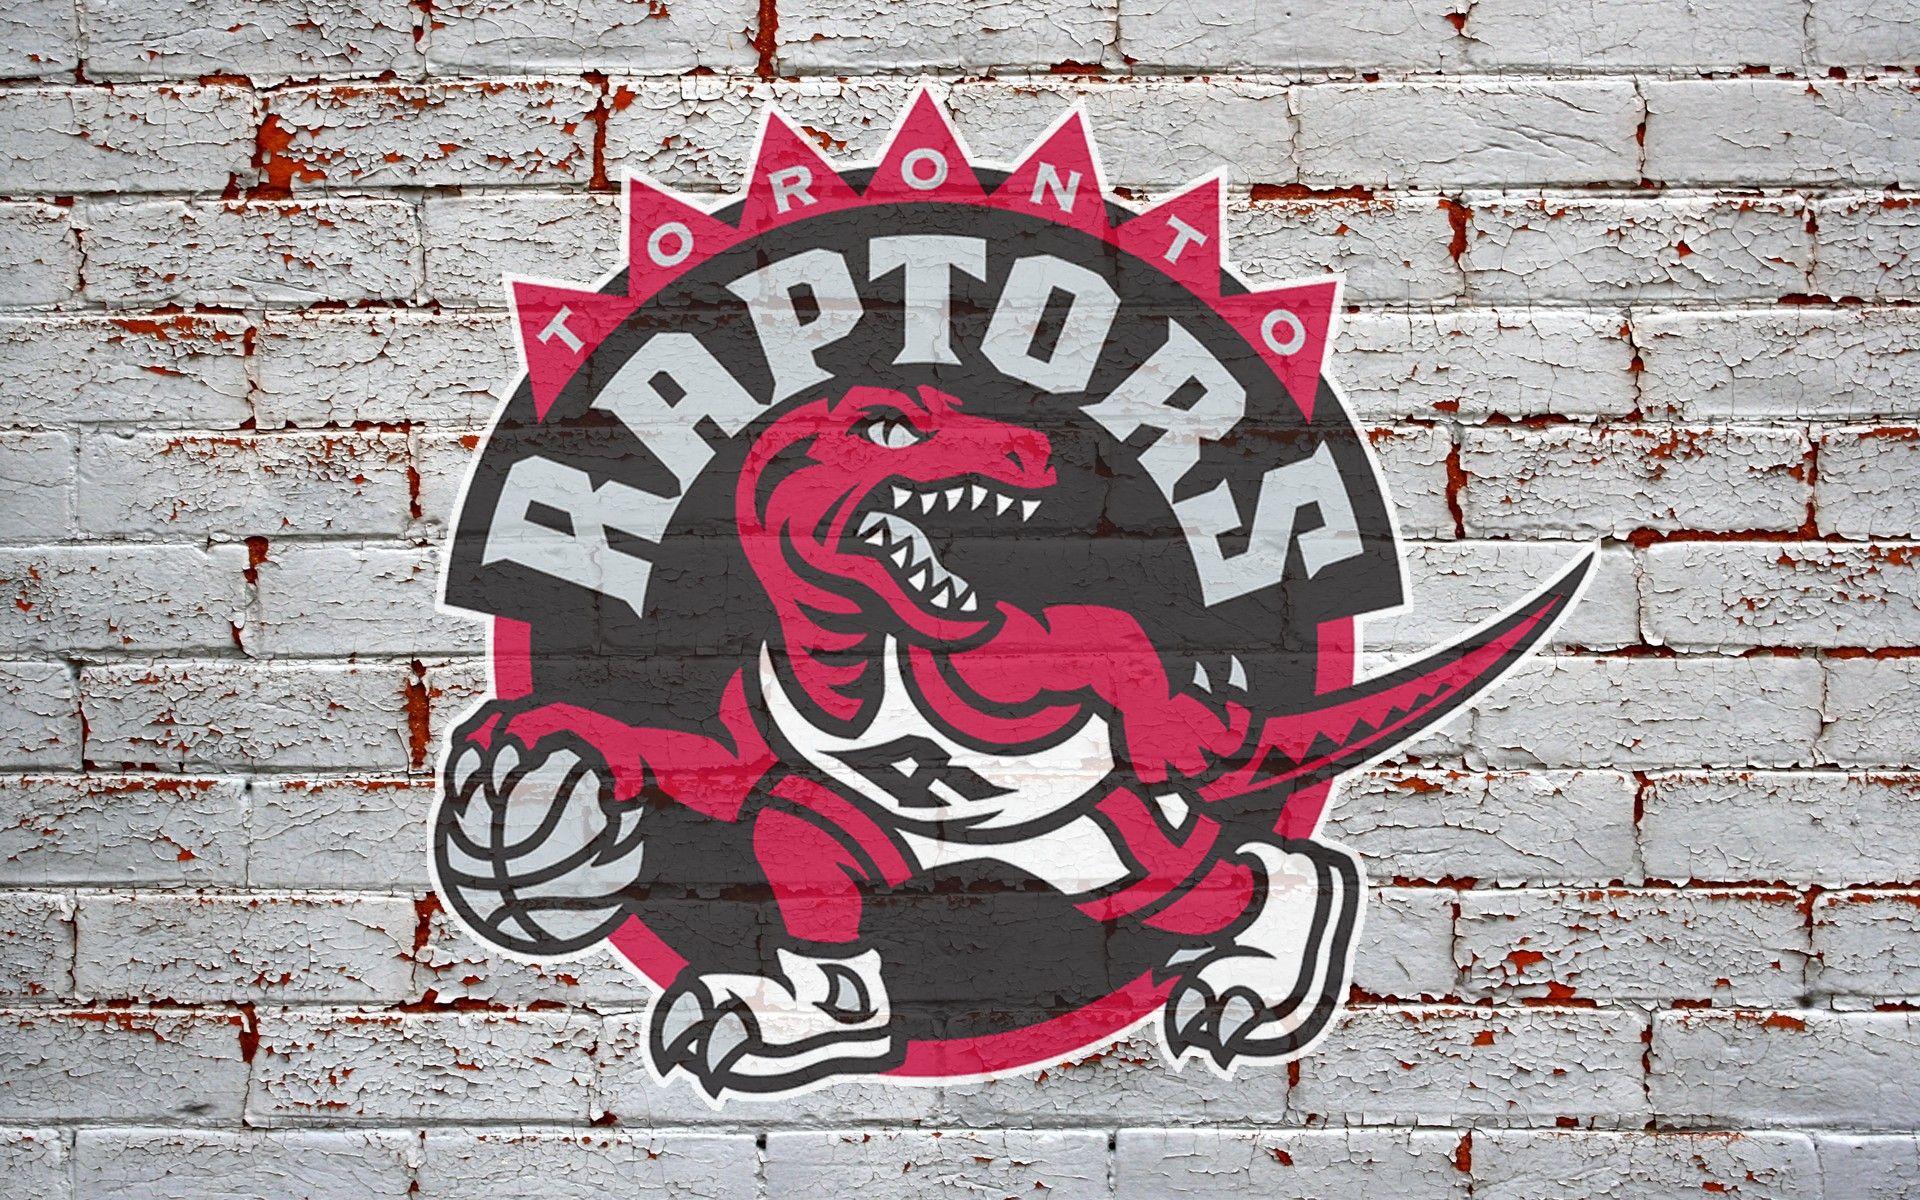 Amazing Wallpaper Logo Toronto Raptor - 9bced3c65254f0899919de805bf0a704  Picture_416452.jpg